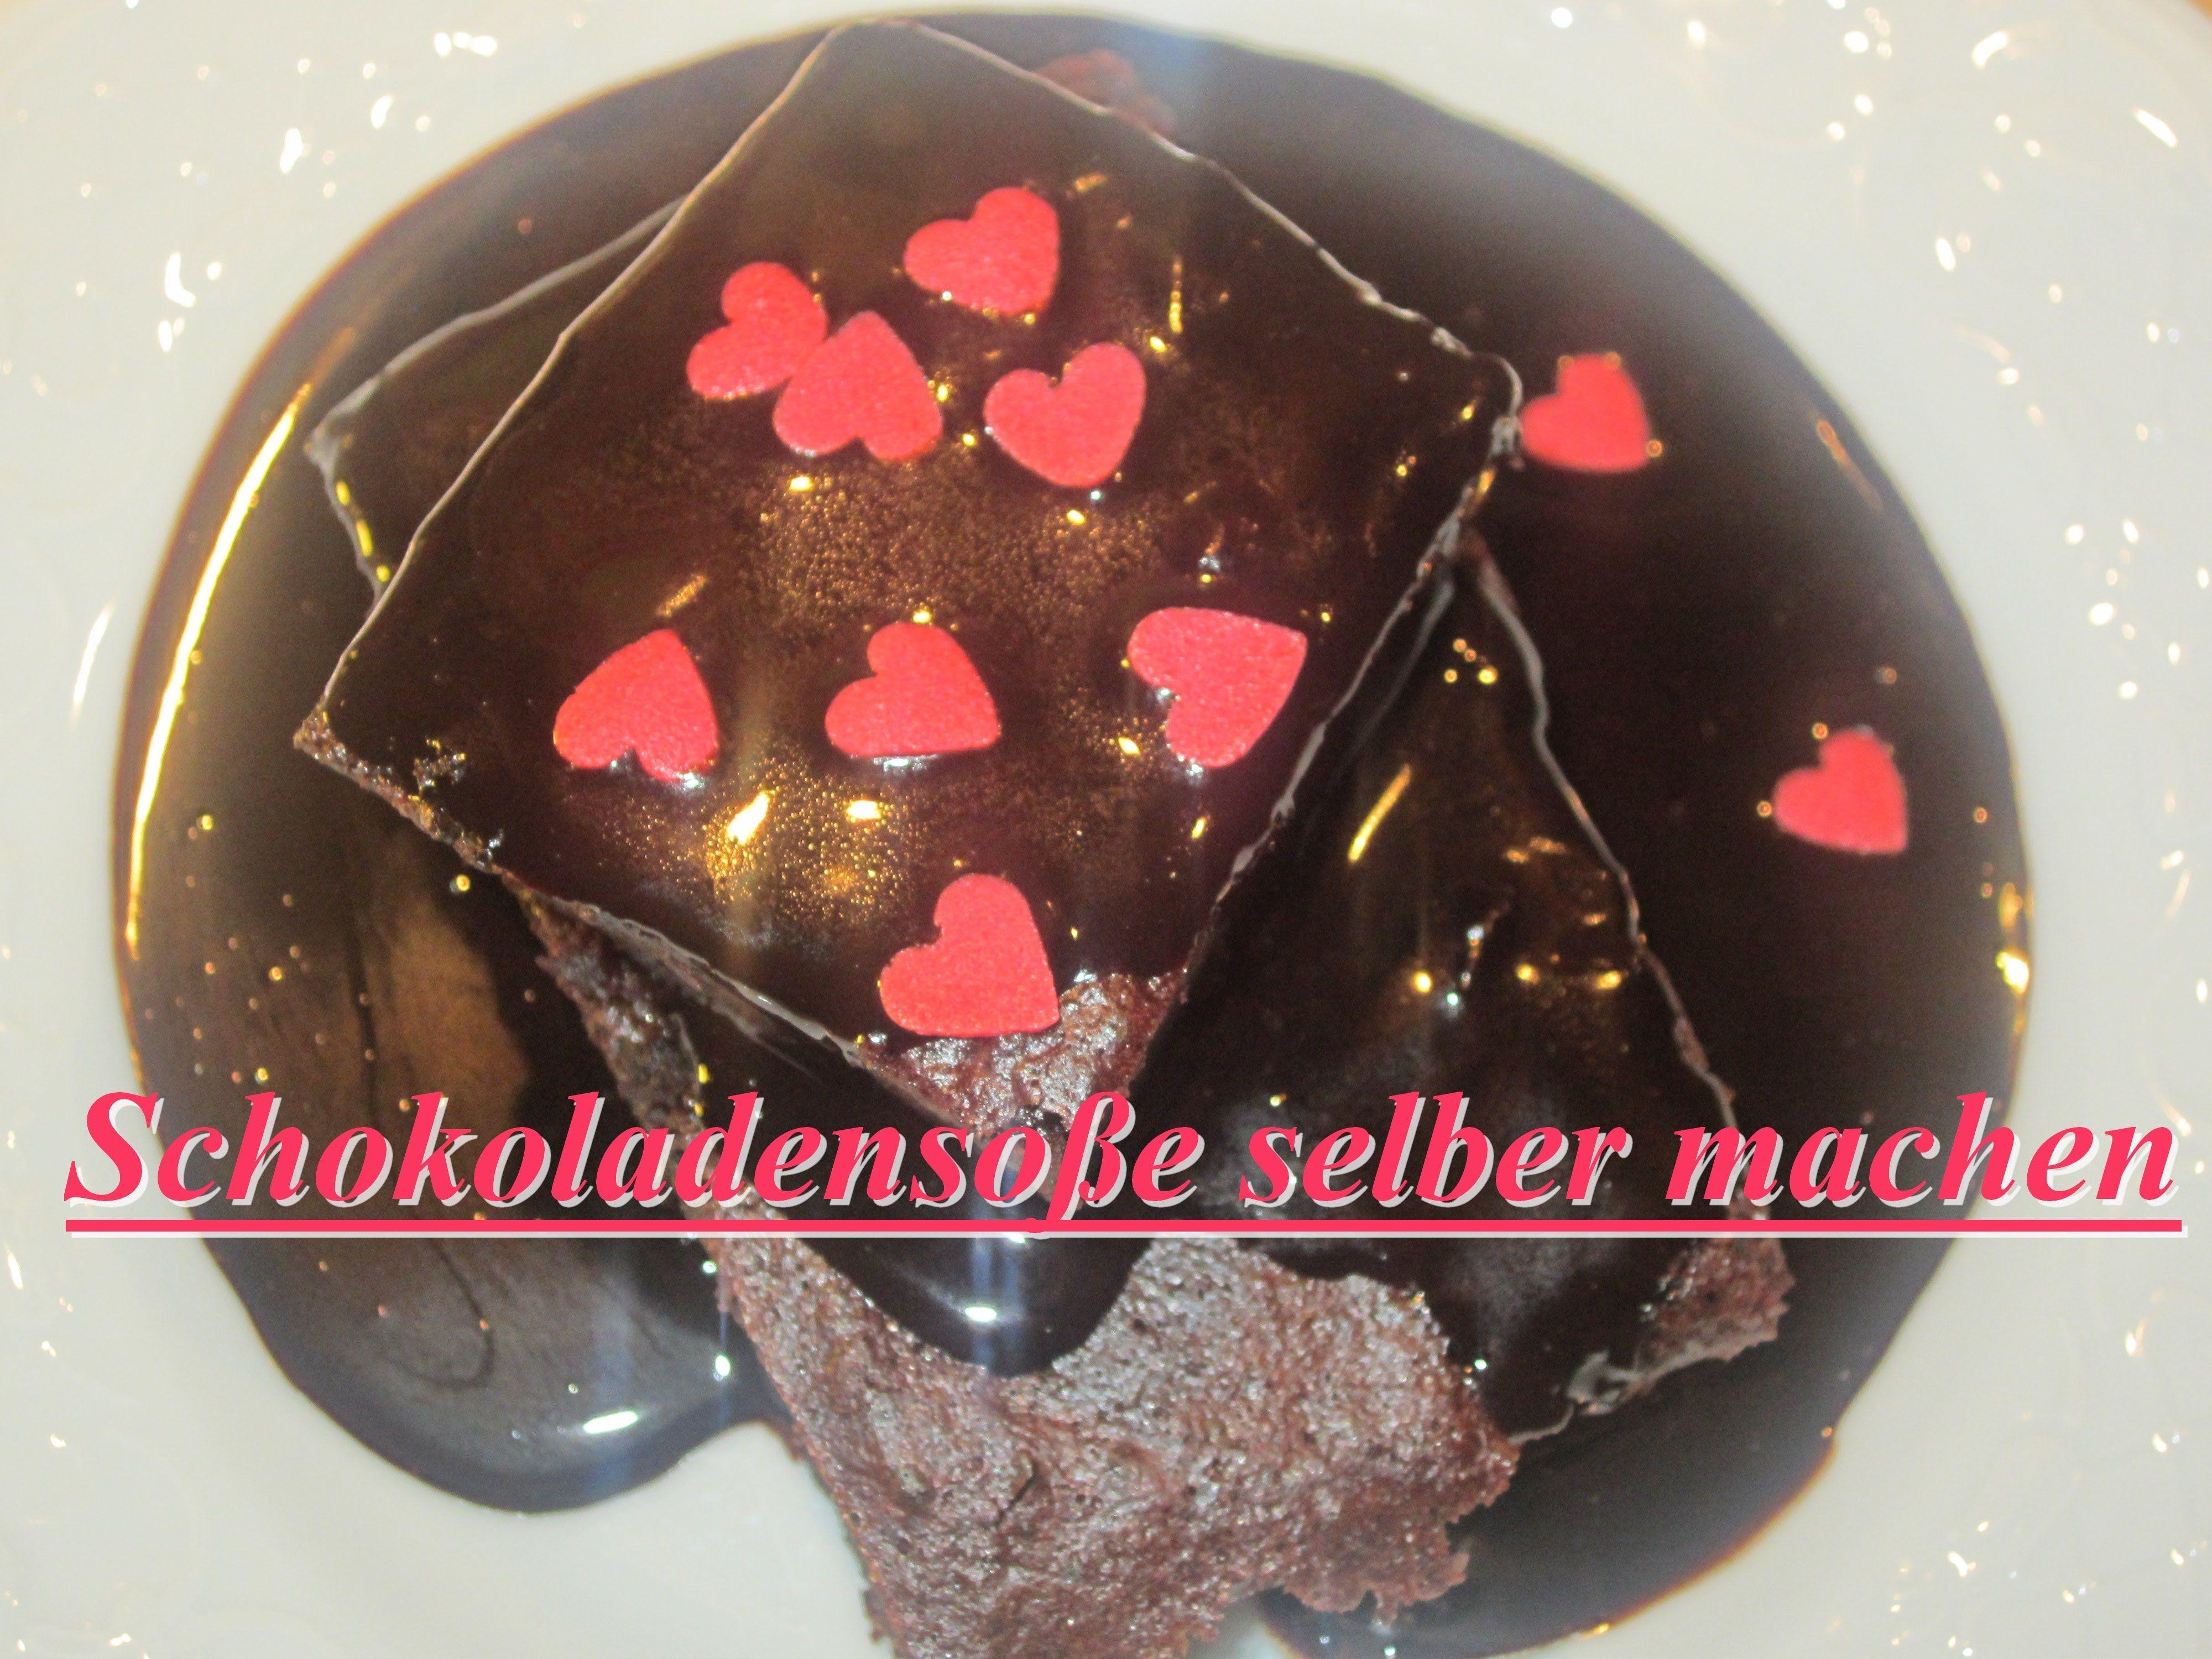 Schokoladensoße in 5 Minuten selber machen | DIY | Dessertsauce Rezept |...